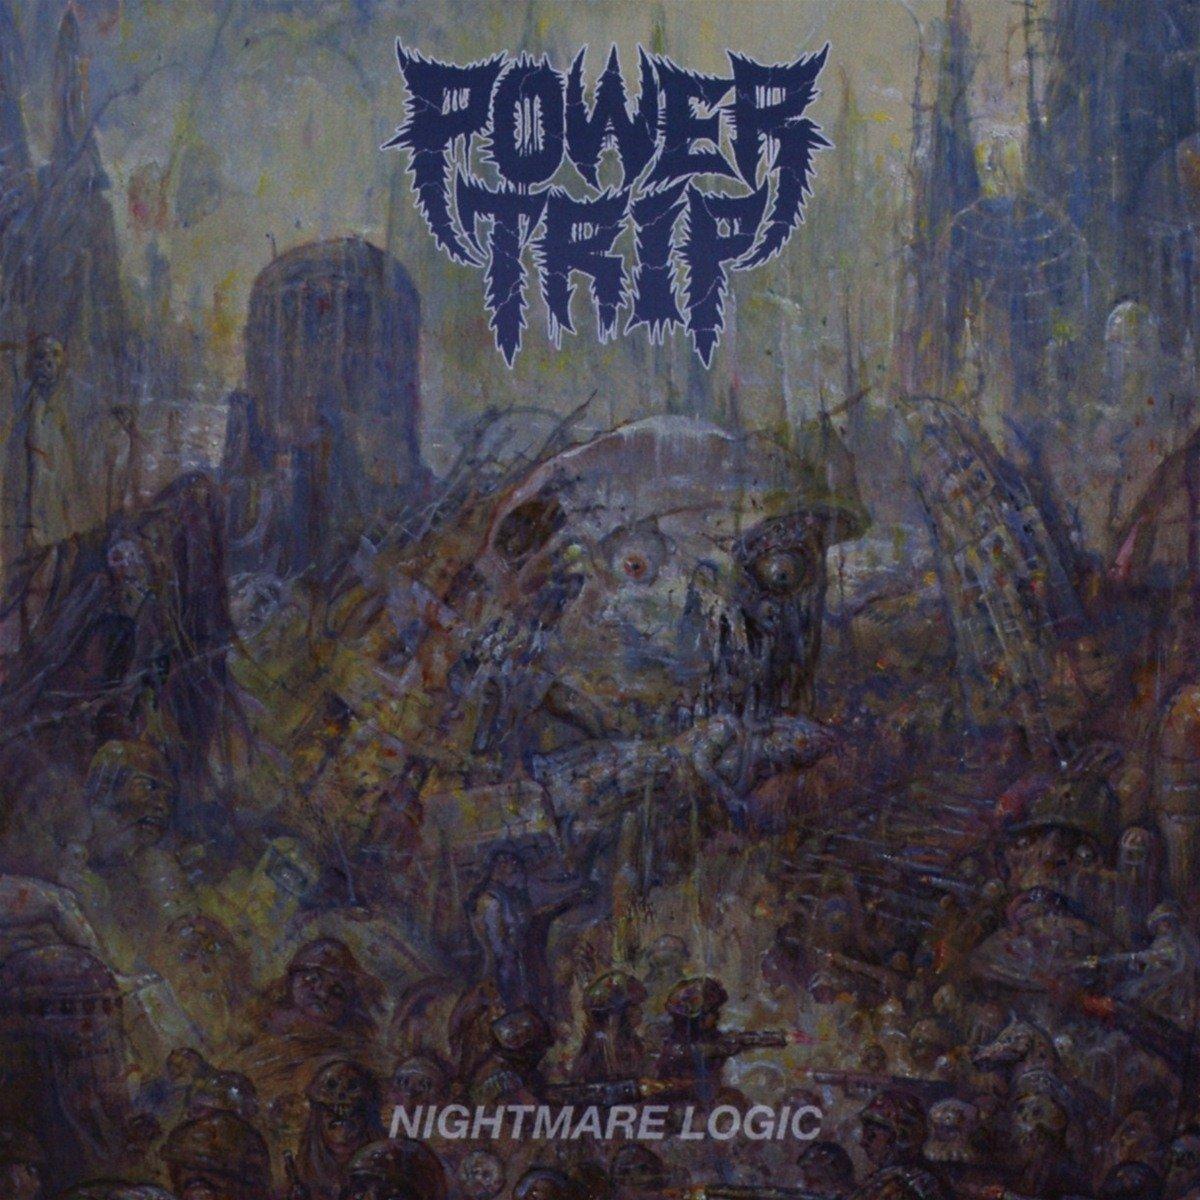 Power Trip: Nightmare Logic | Amazon.com.br